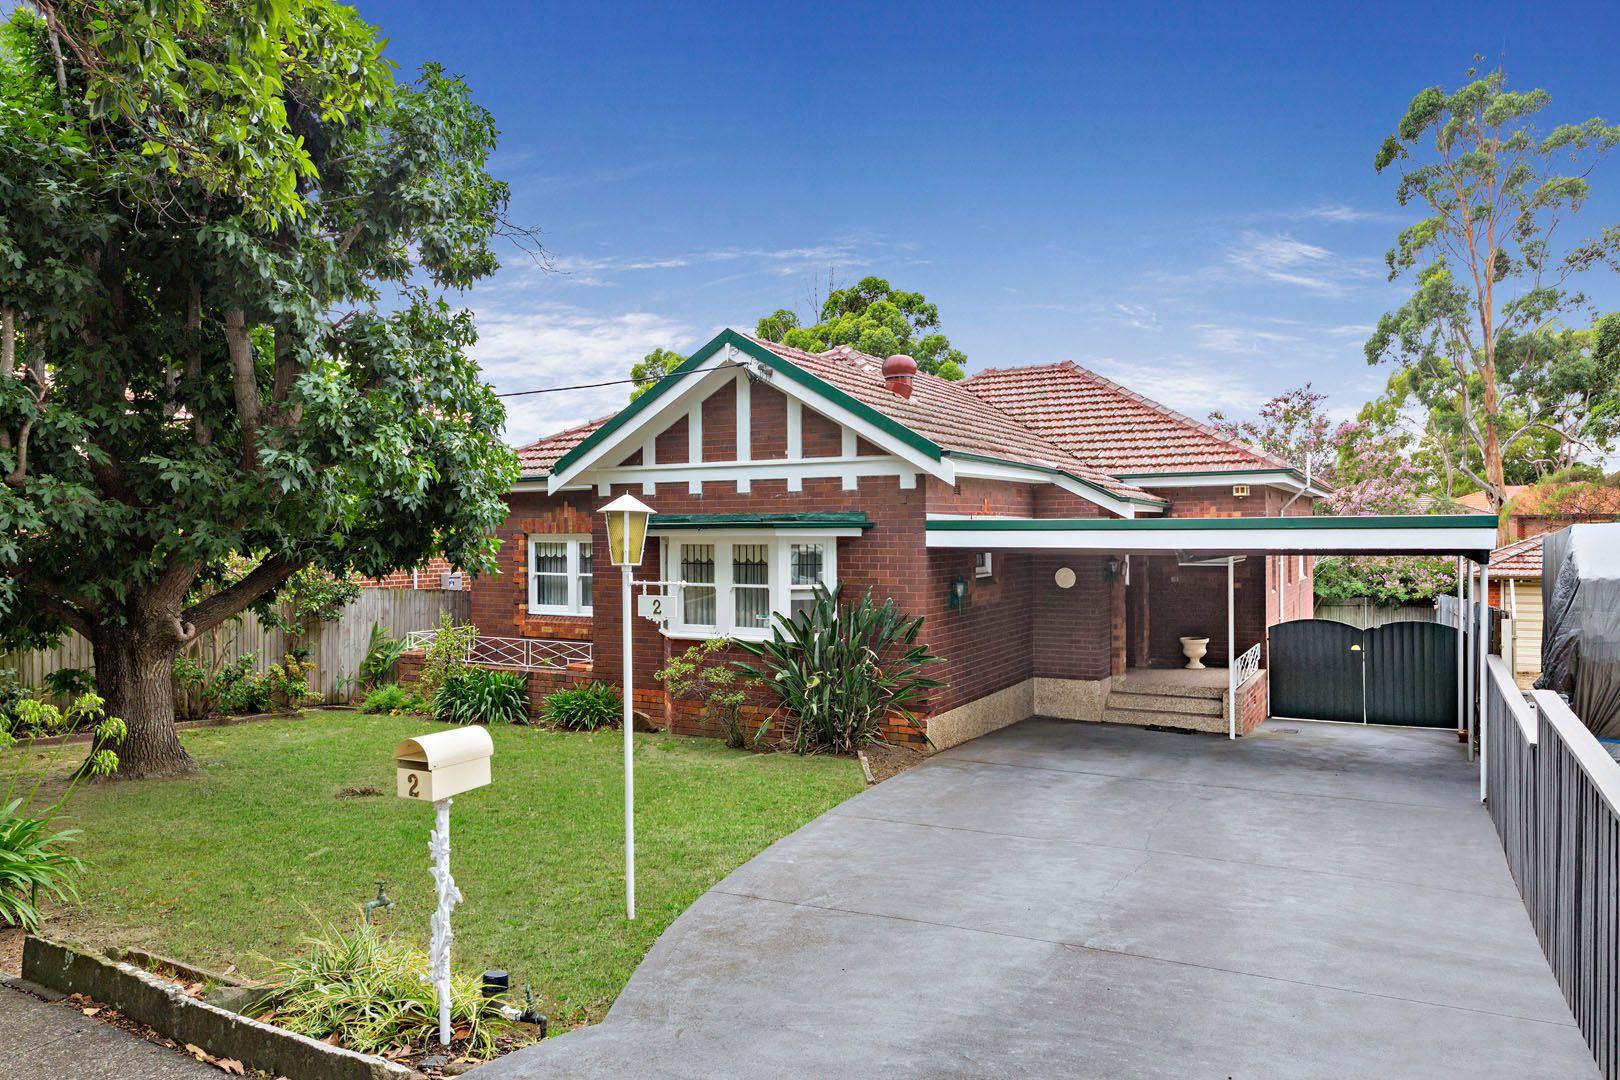 2 MARION STREET, Strathfield NSW 2135, Image 0